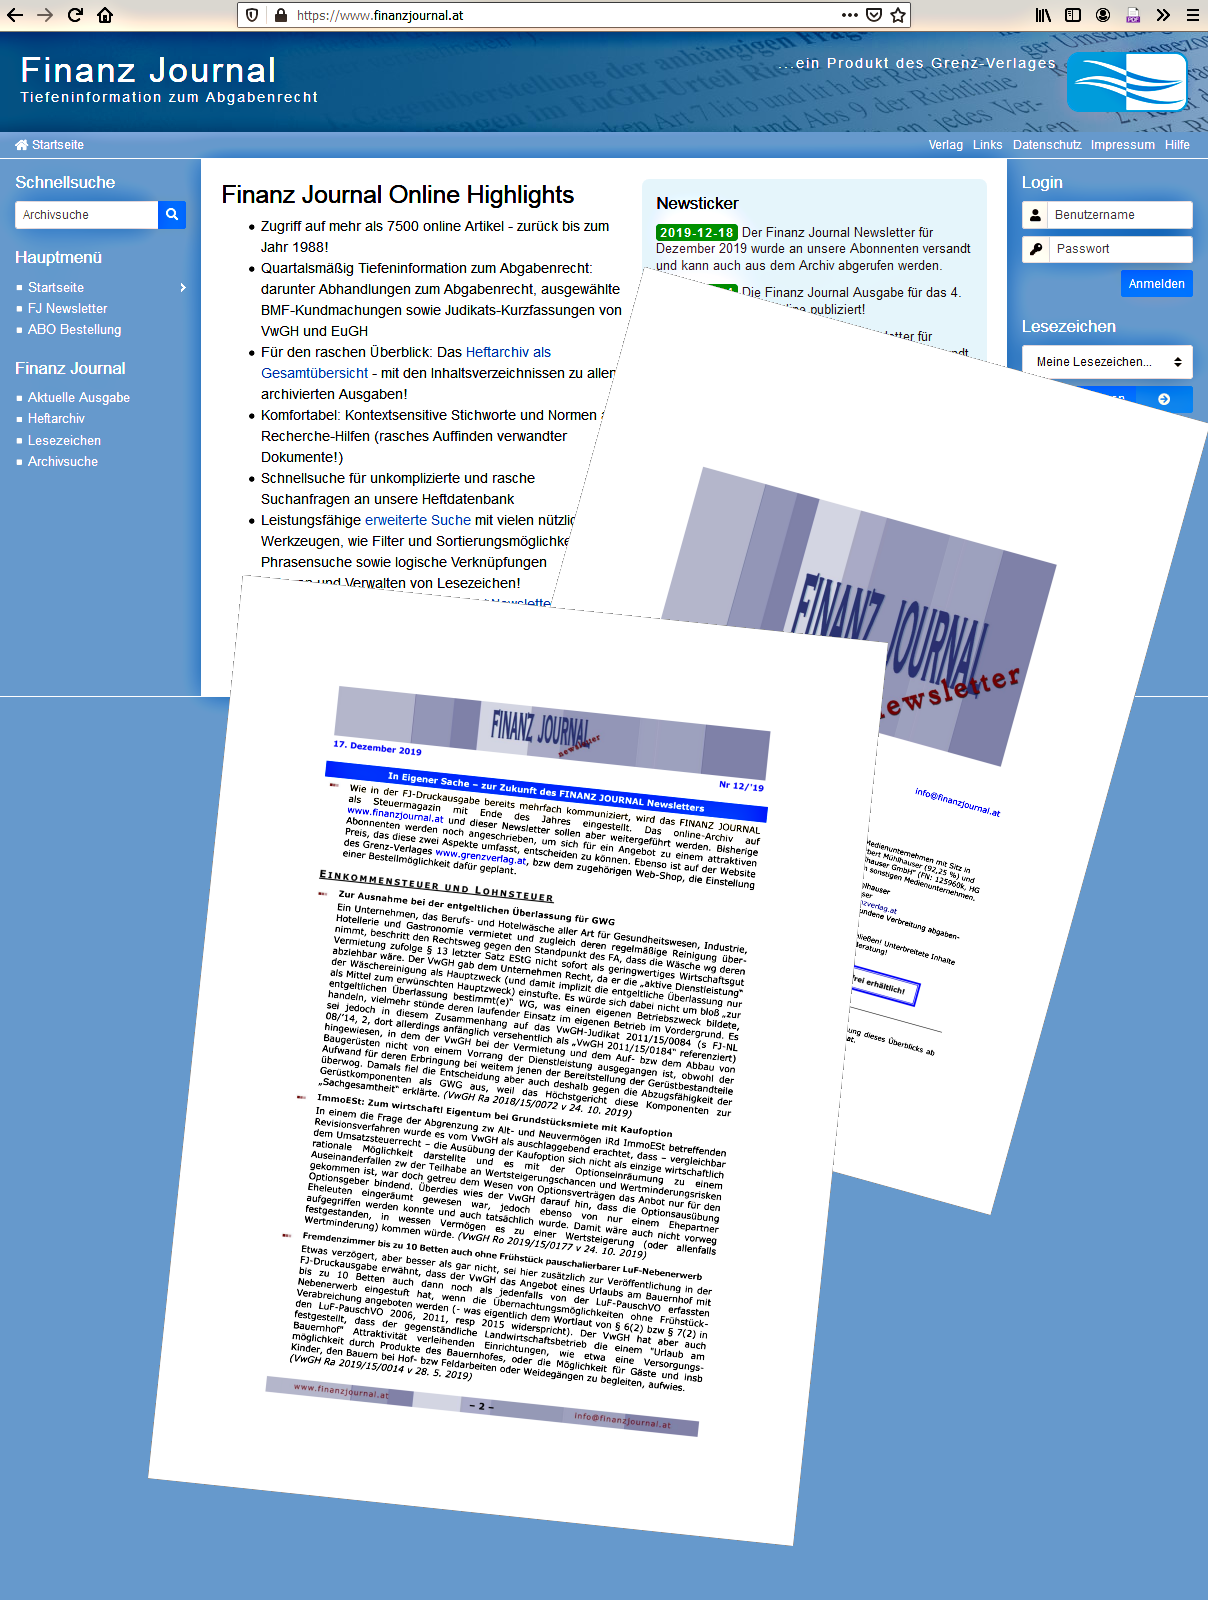 FinanzJournal Cover